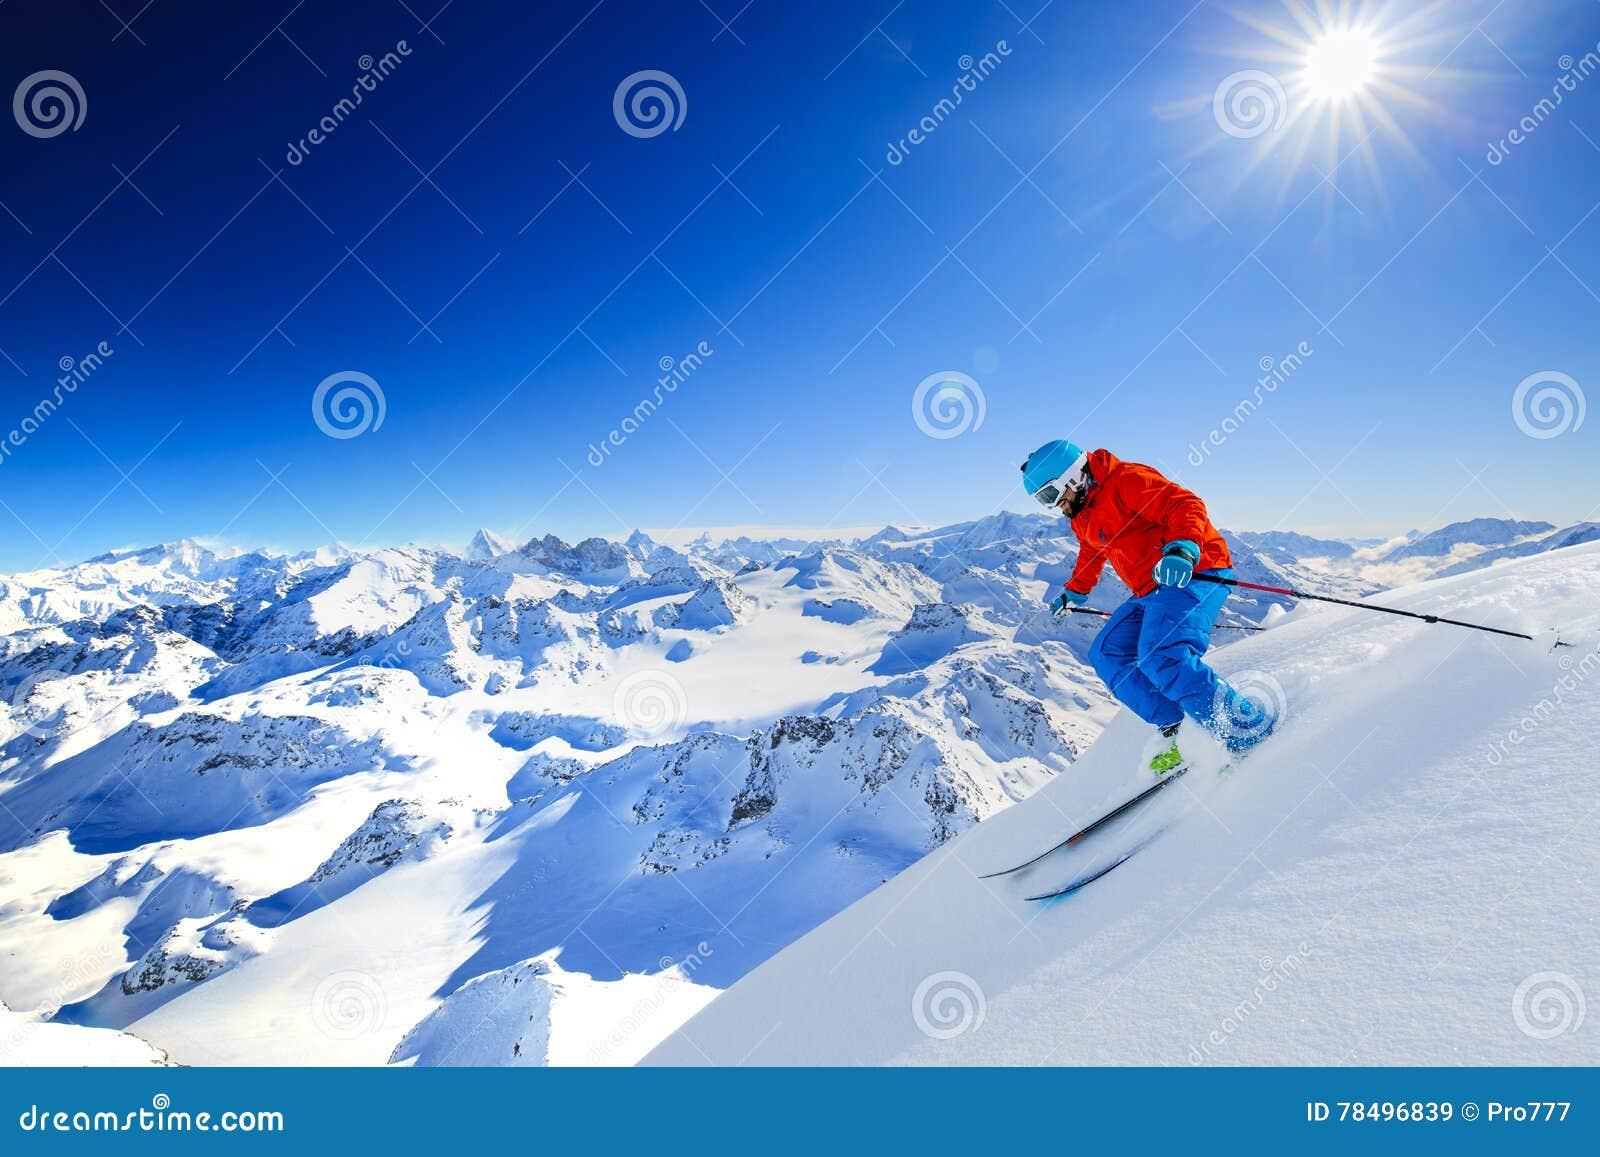 Ski touring man reaching the top in Swiss Alps.